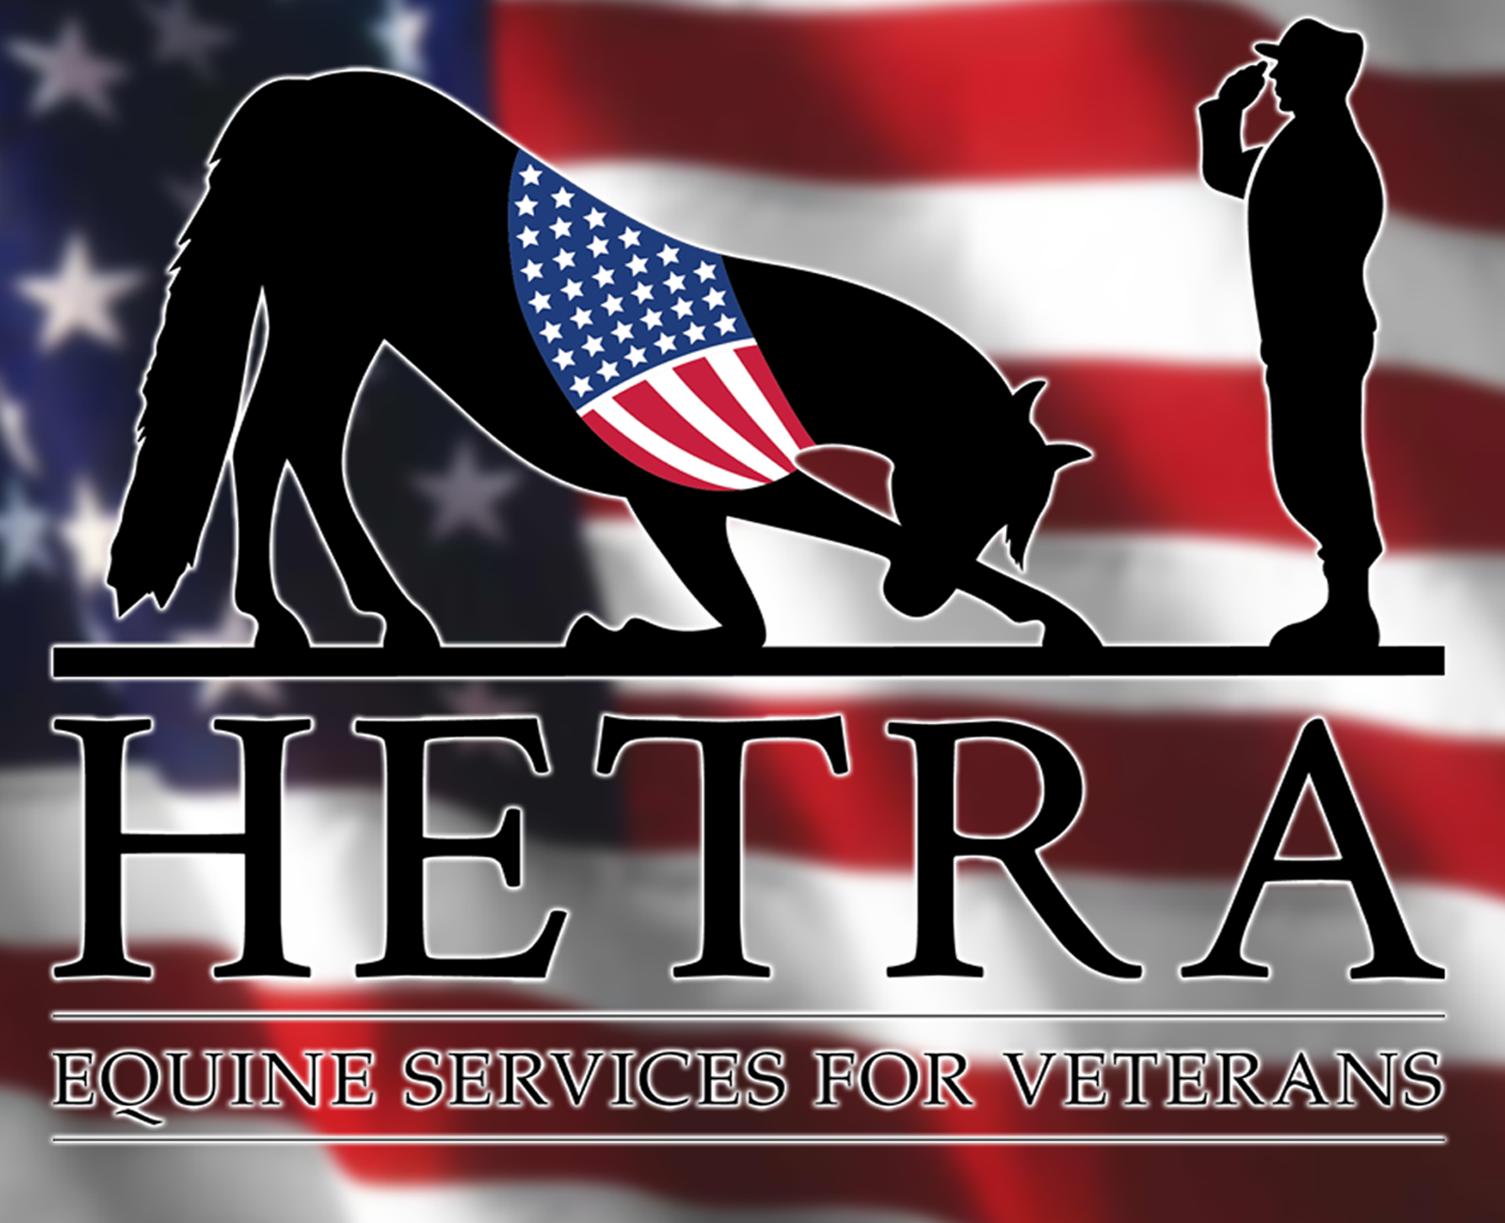 Veterans Experience